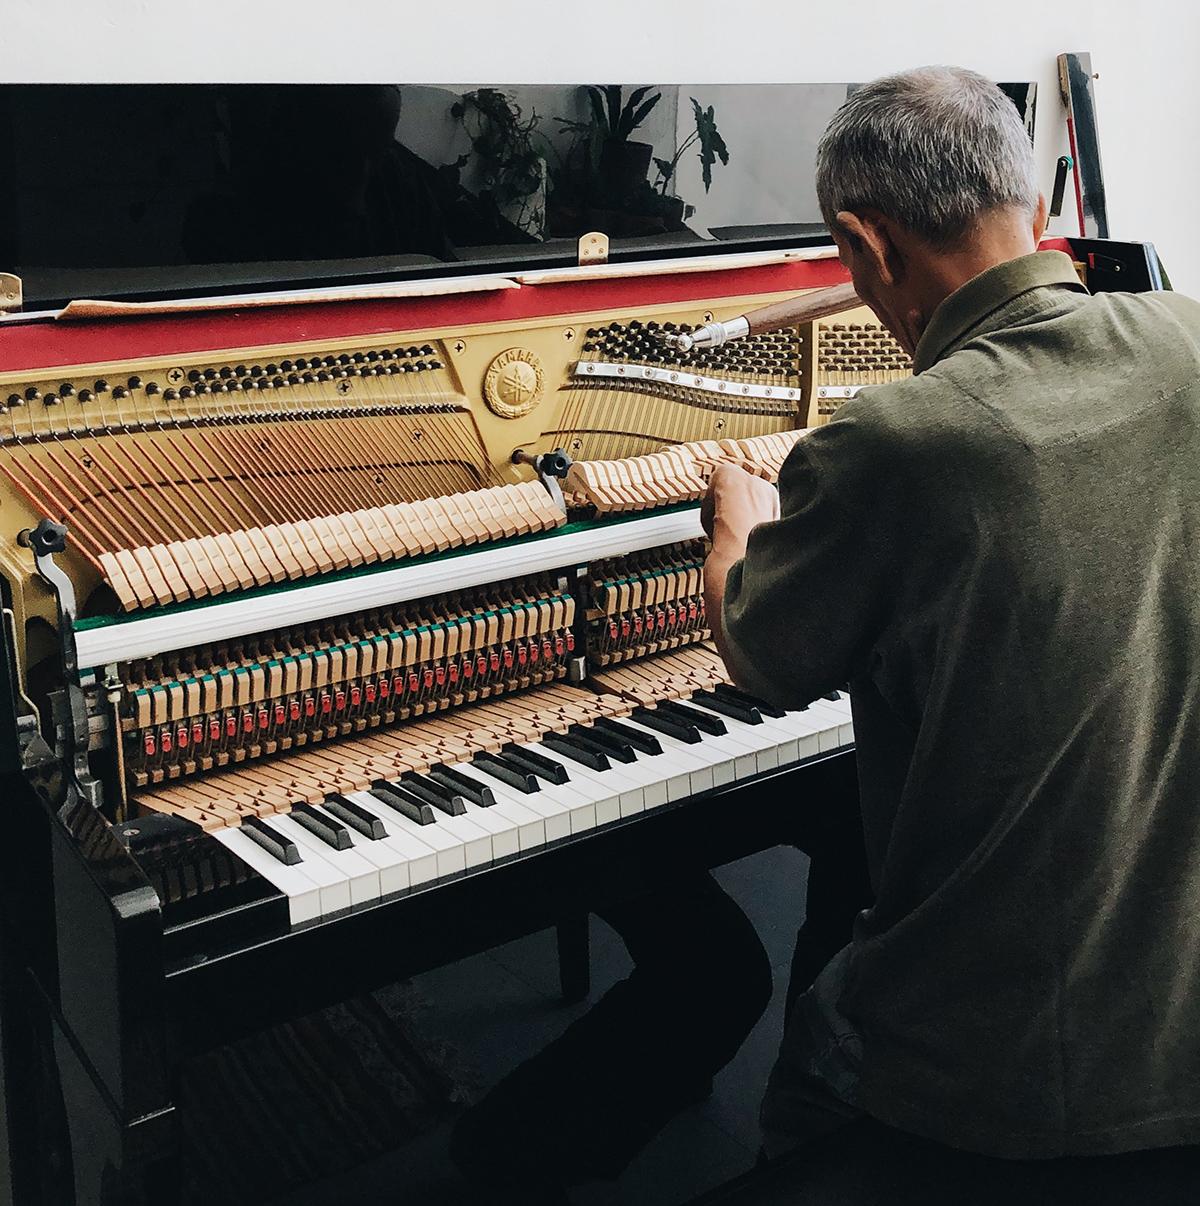 Man tuning upright piano.